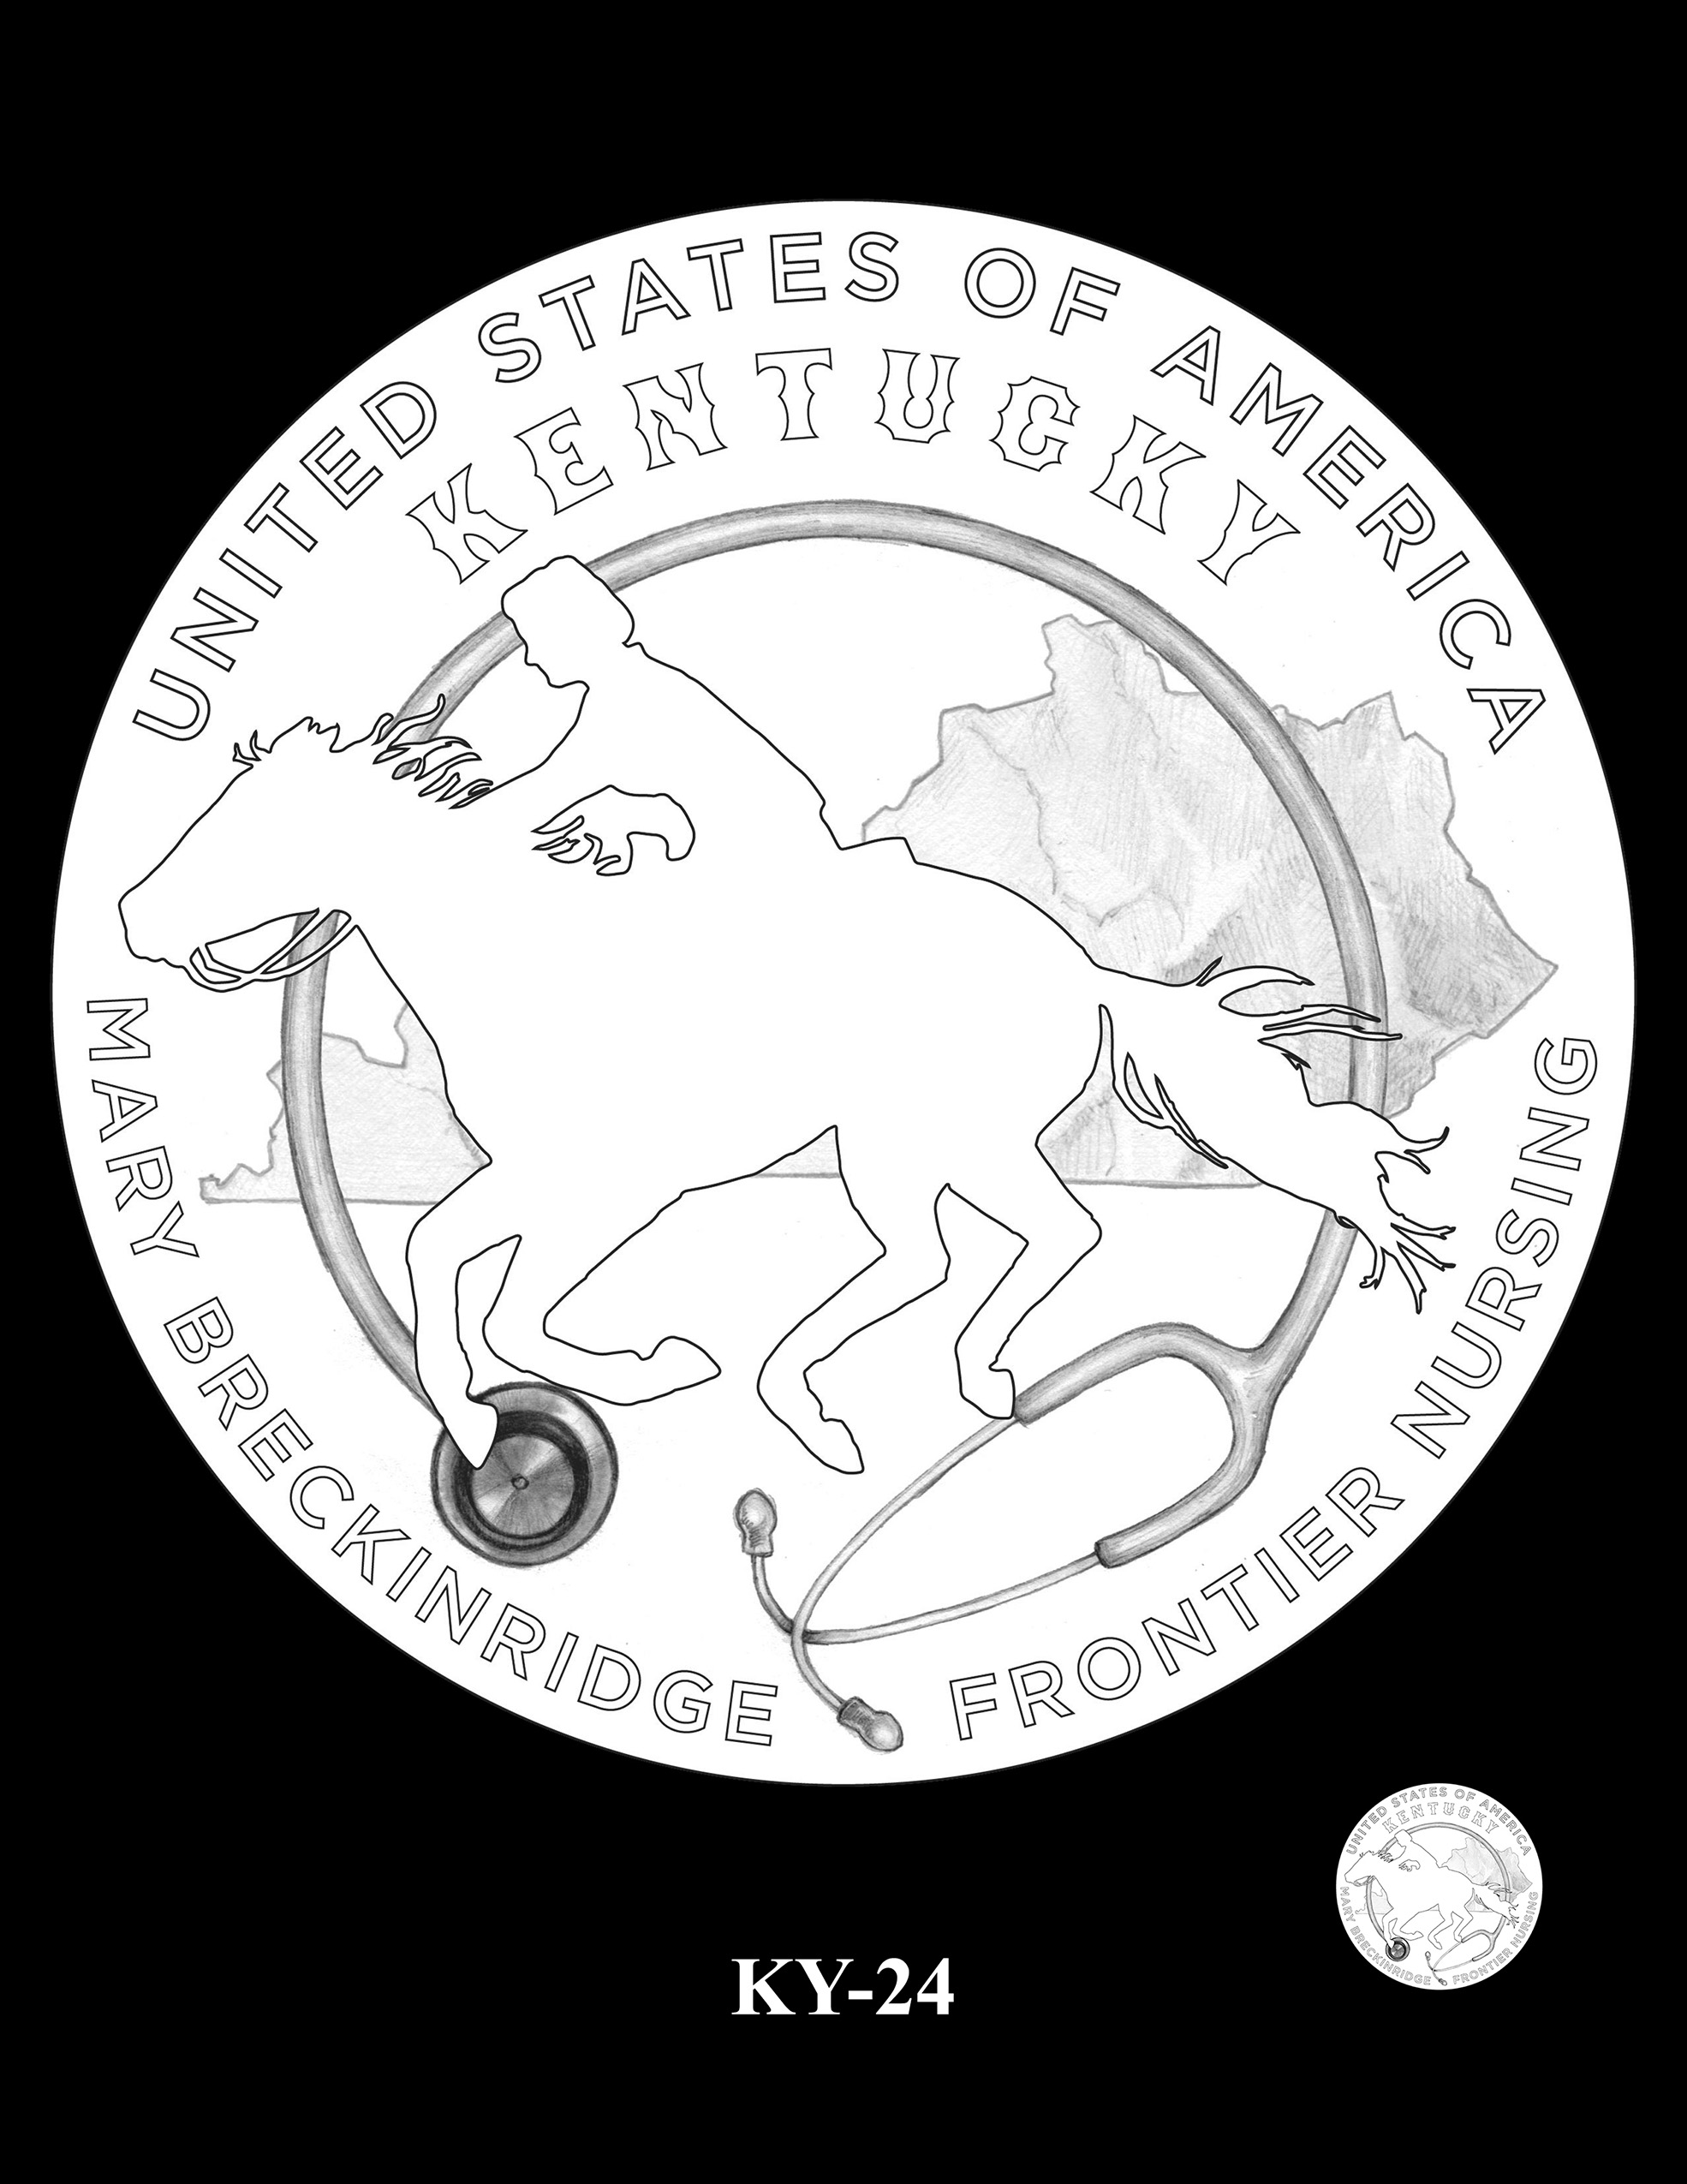 KY-24 -- 2022 American Innovation $1 Coin - Kentucky